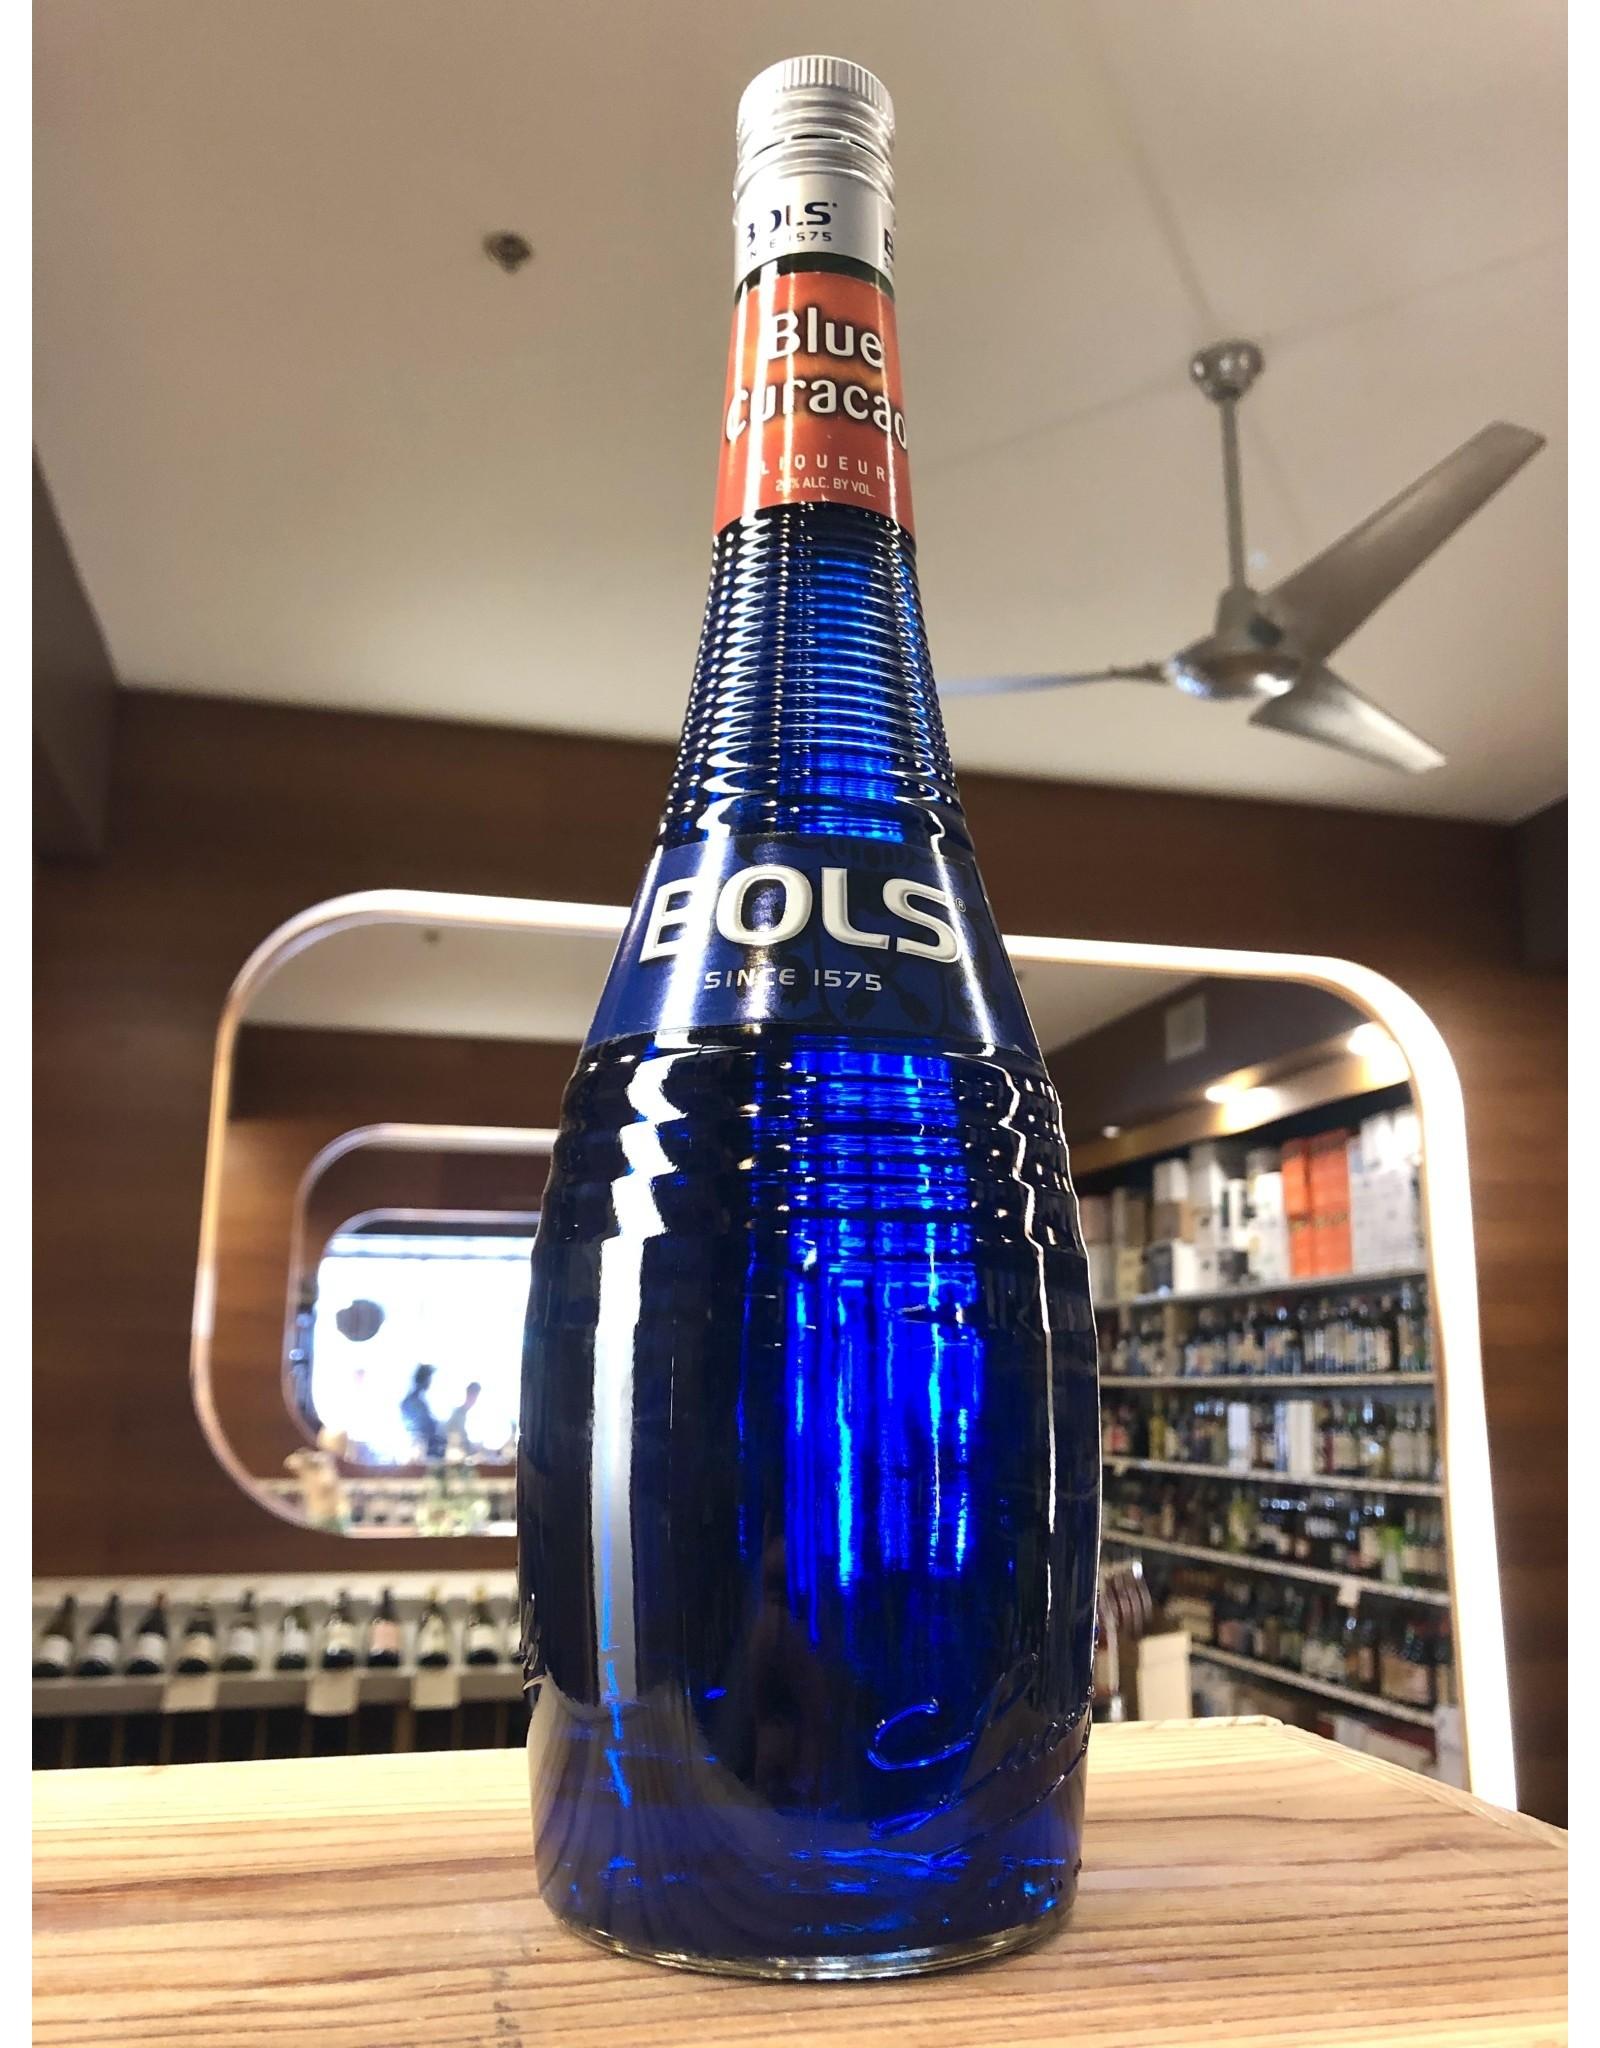 Bols Blue Curacao - 1 Liter